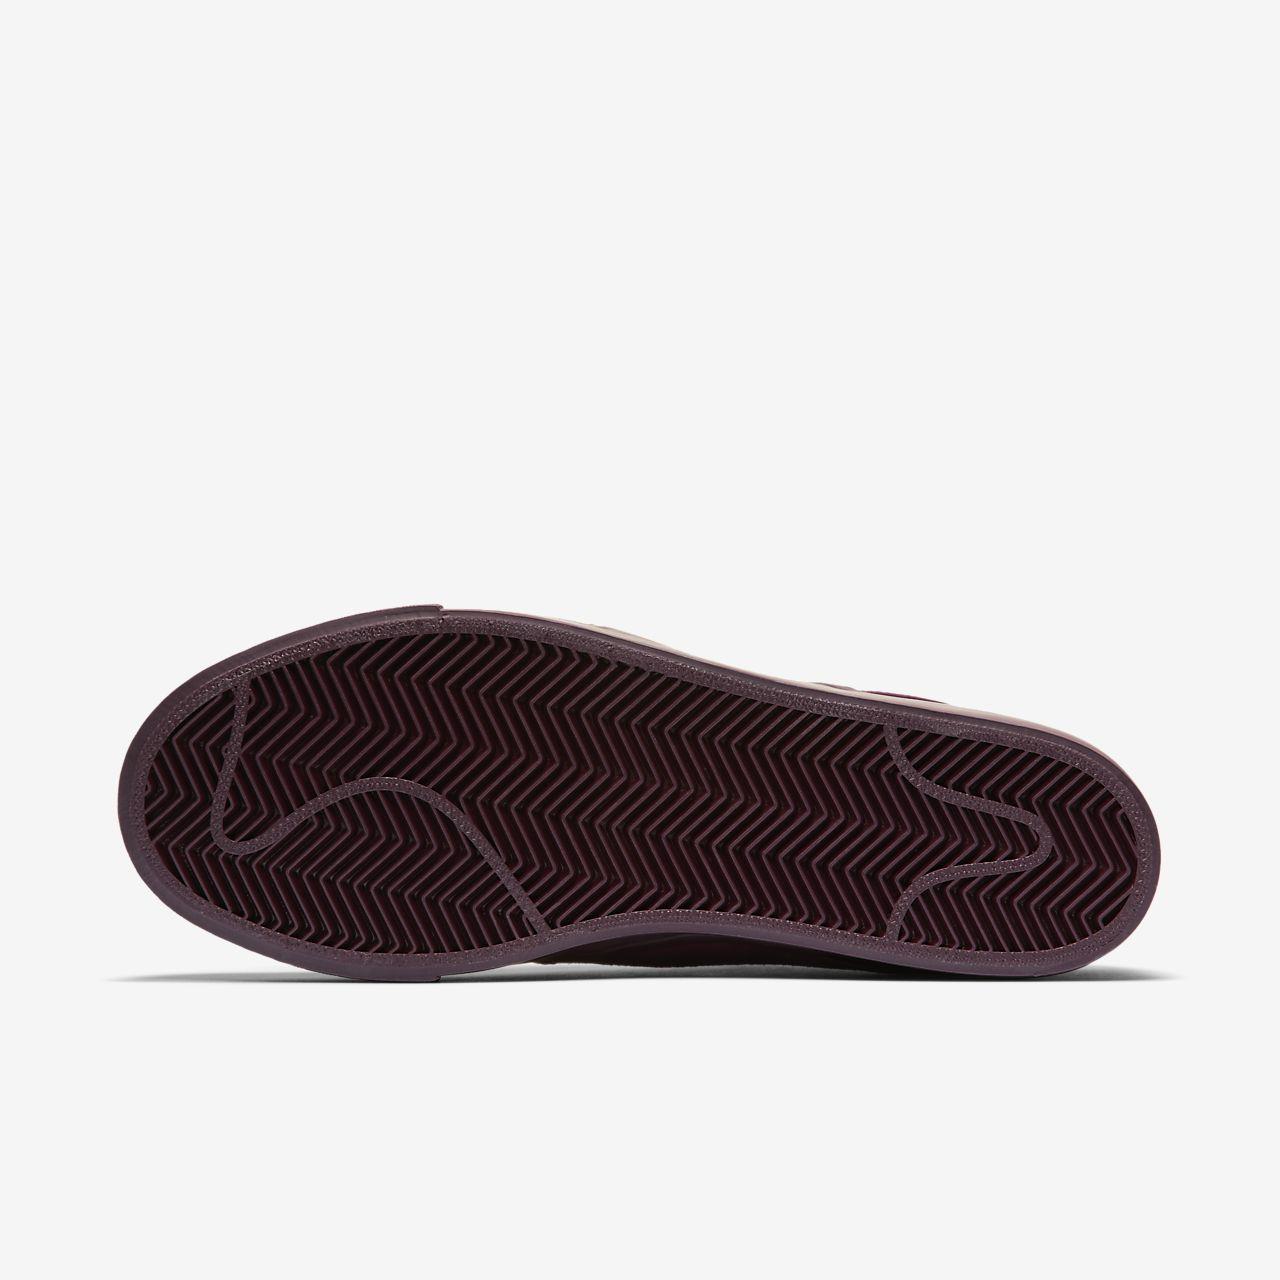 promo code 300e8 2bcb5 ... Nike Zoom Stefan Janoski Men s Skate Shoe